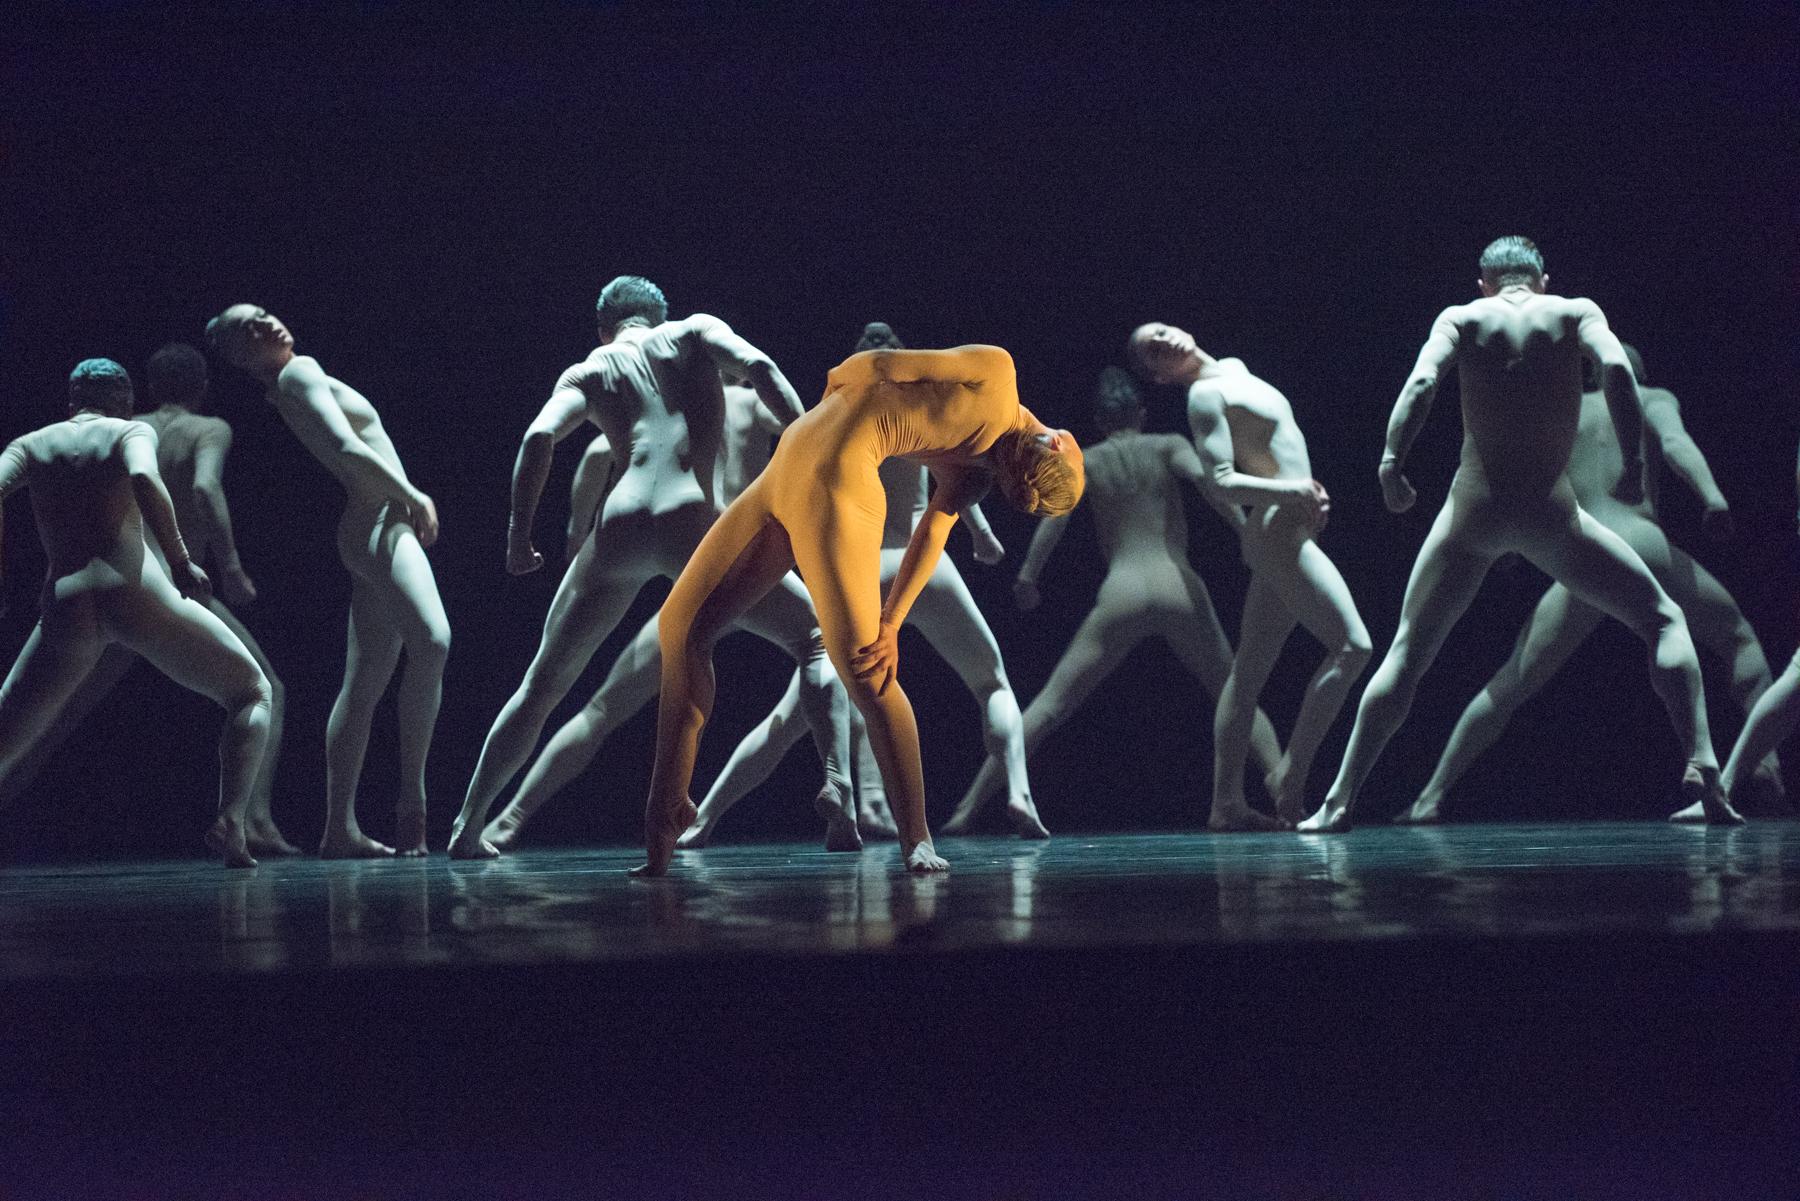 BALLET BC ANNOUNCES PROGRAM 3 OF ITS 2017/18 SEASON